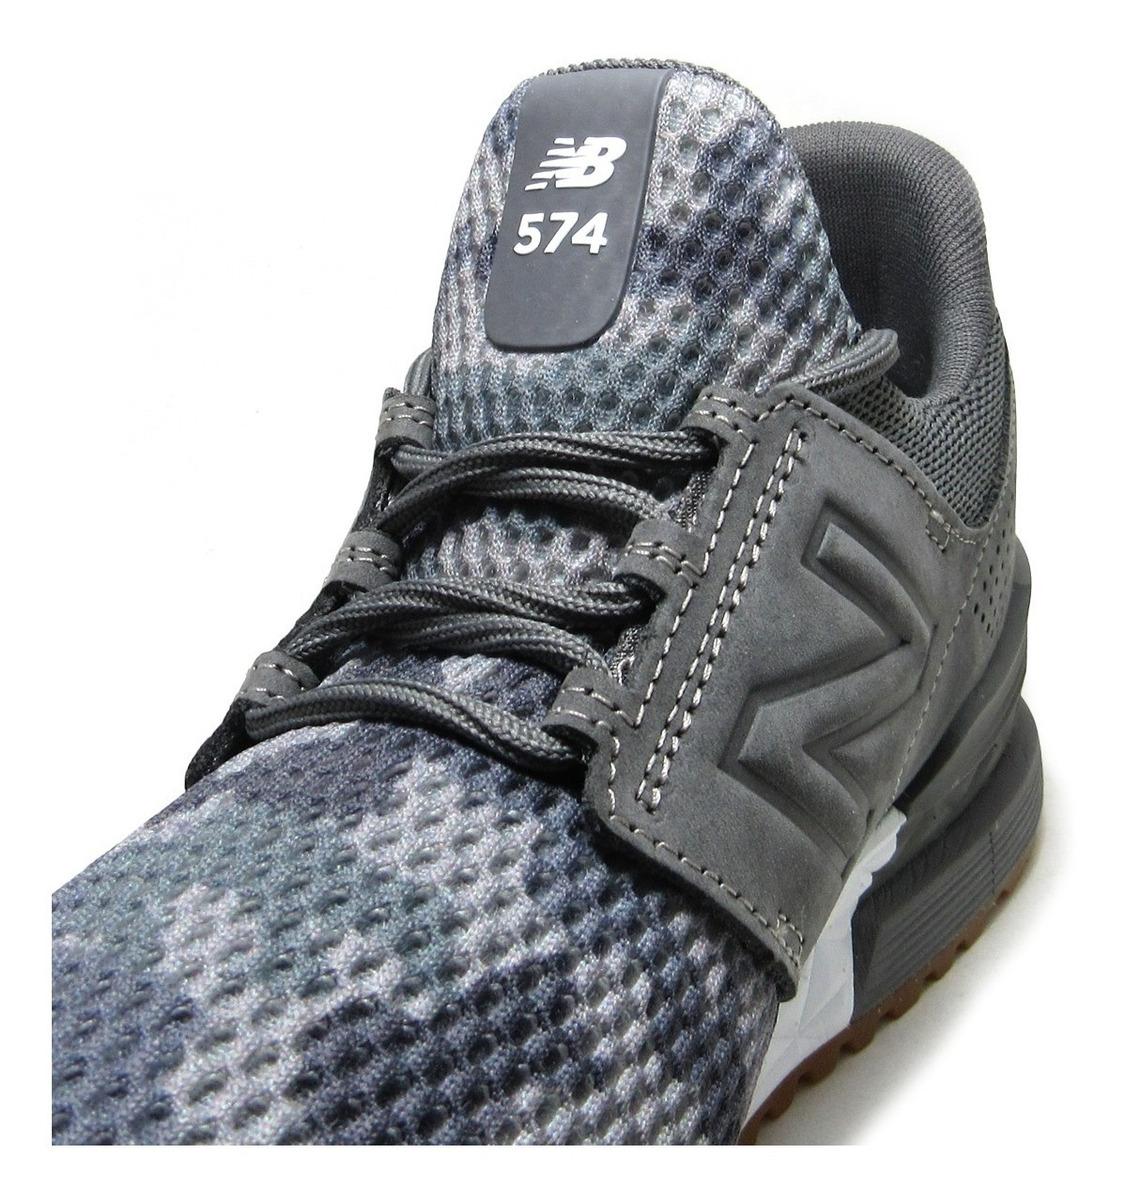 AJF,new balance 754 sport,nalan.com.sg